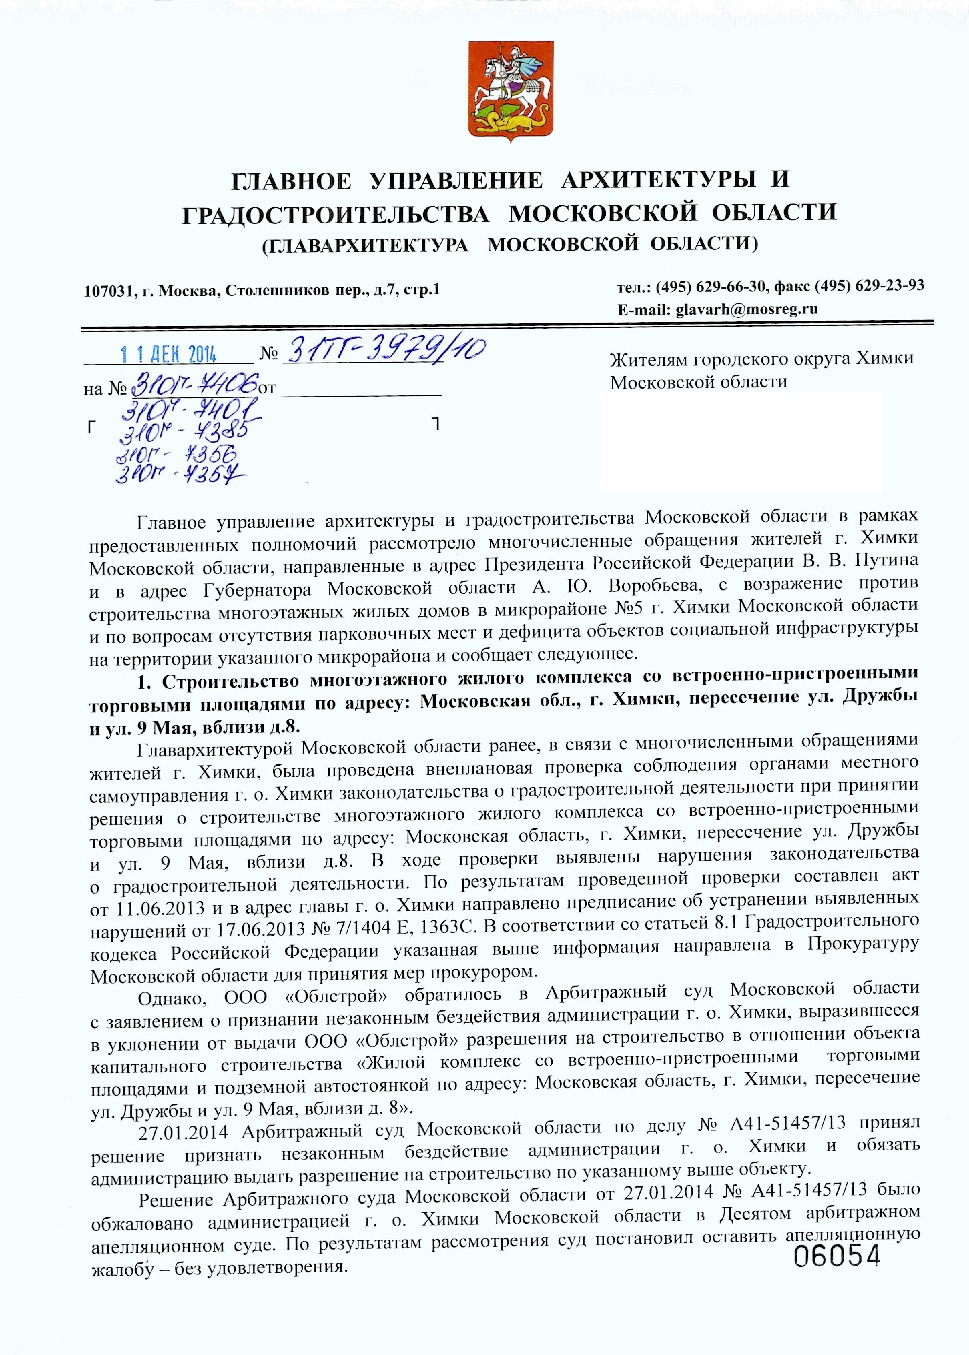 12-2014 Главархитектура1